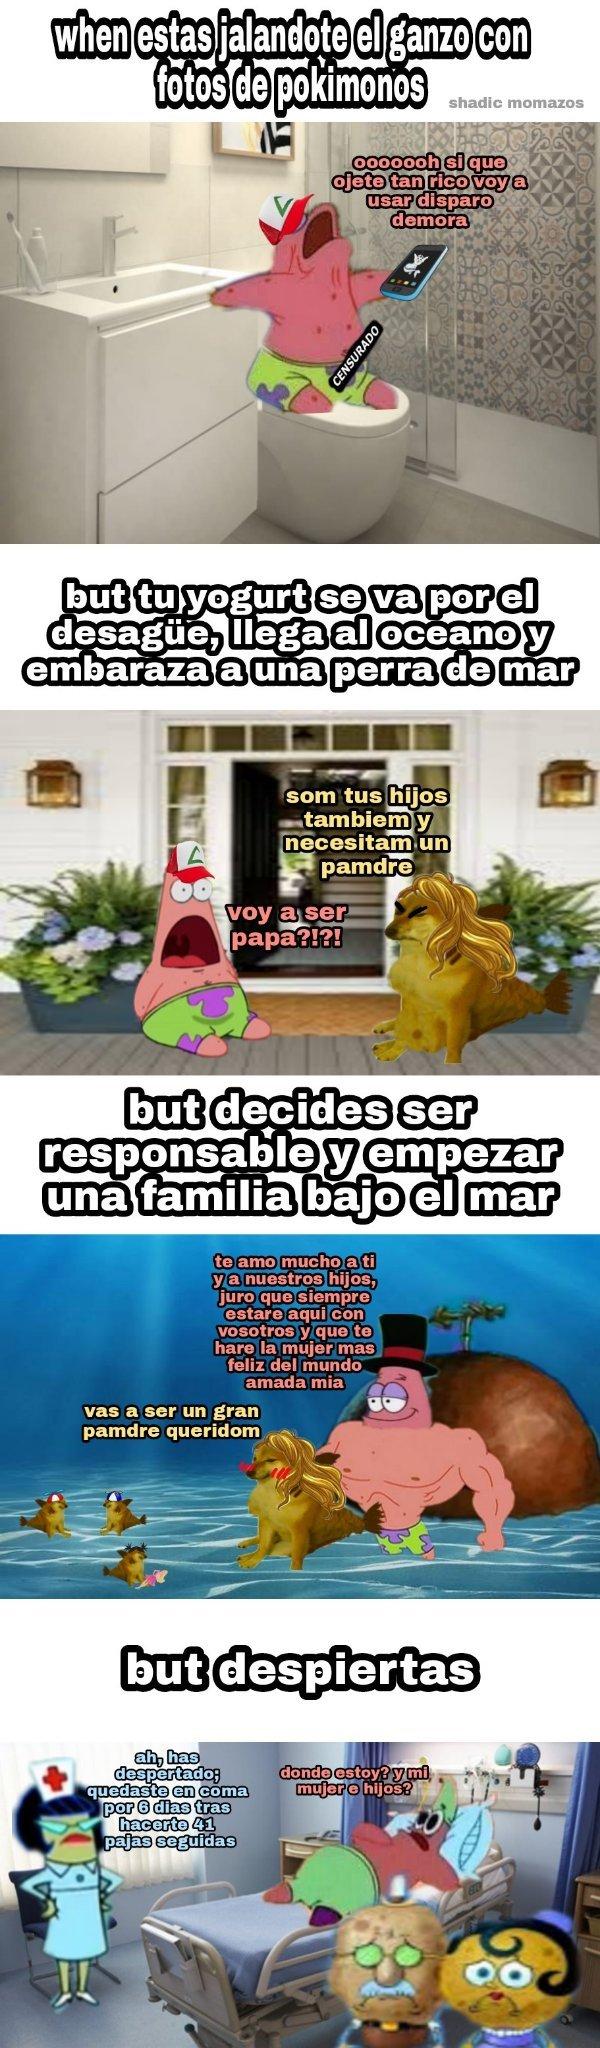 Increible historia - meme